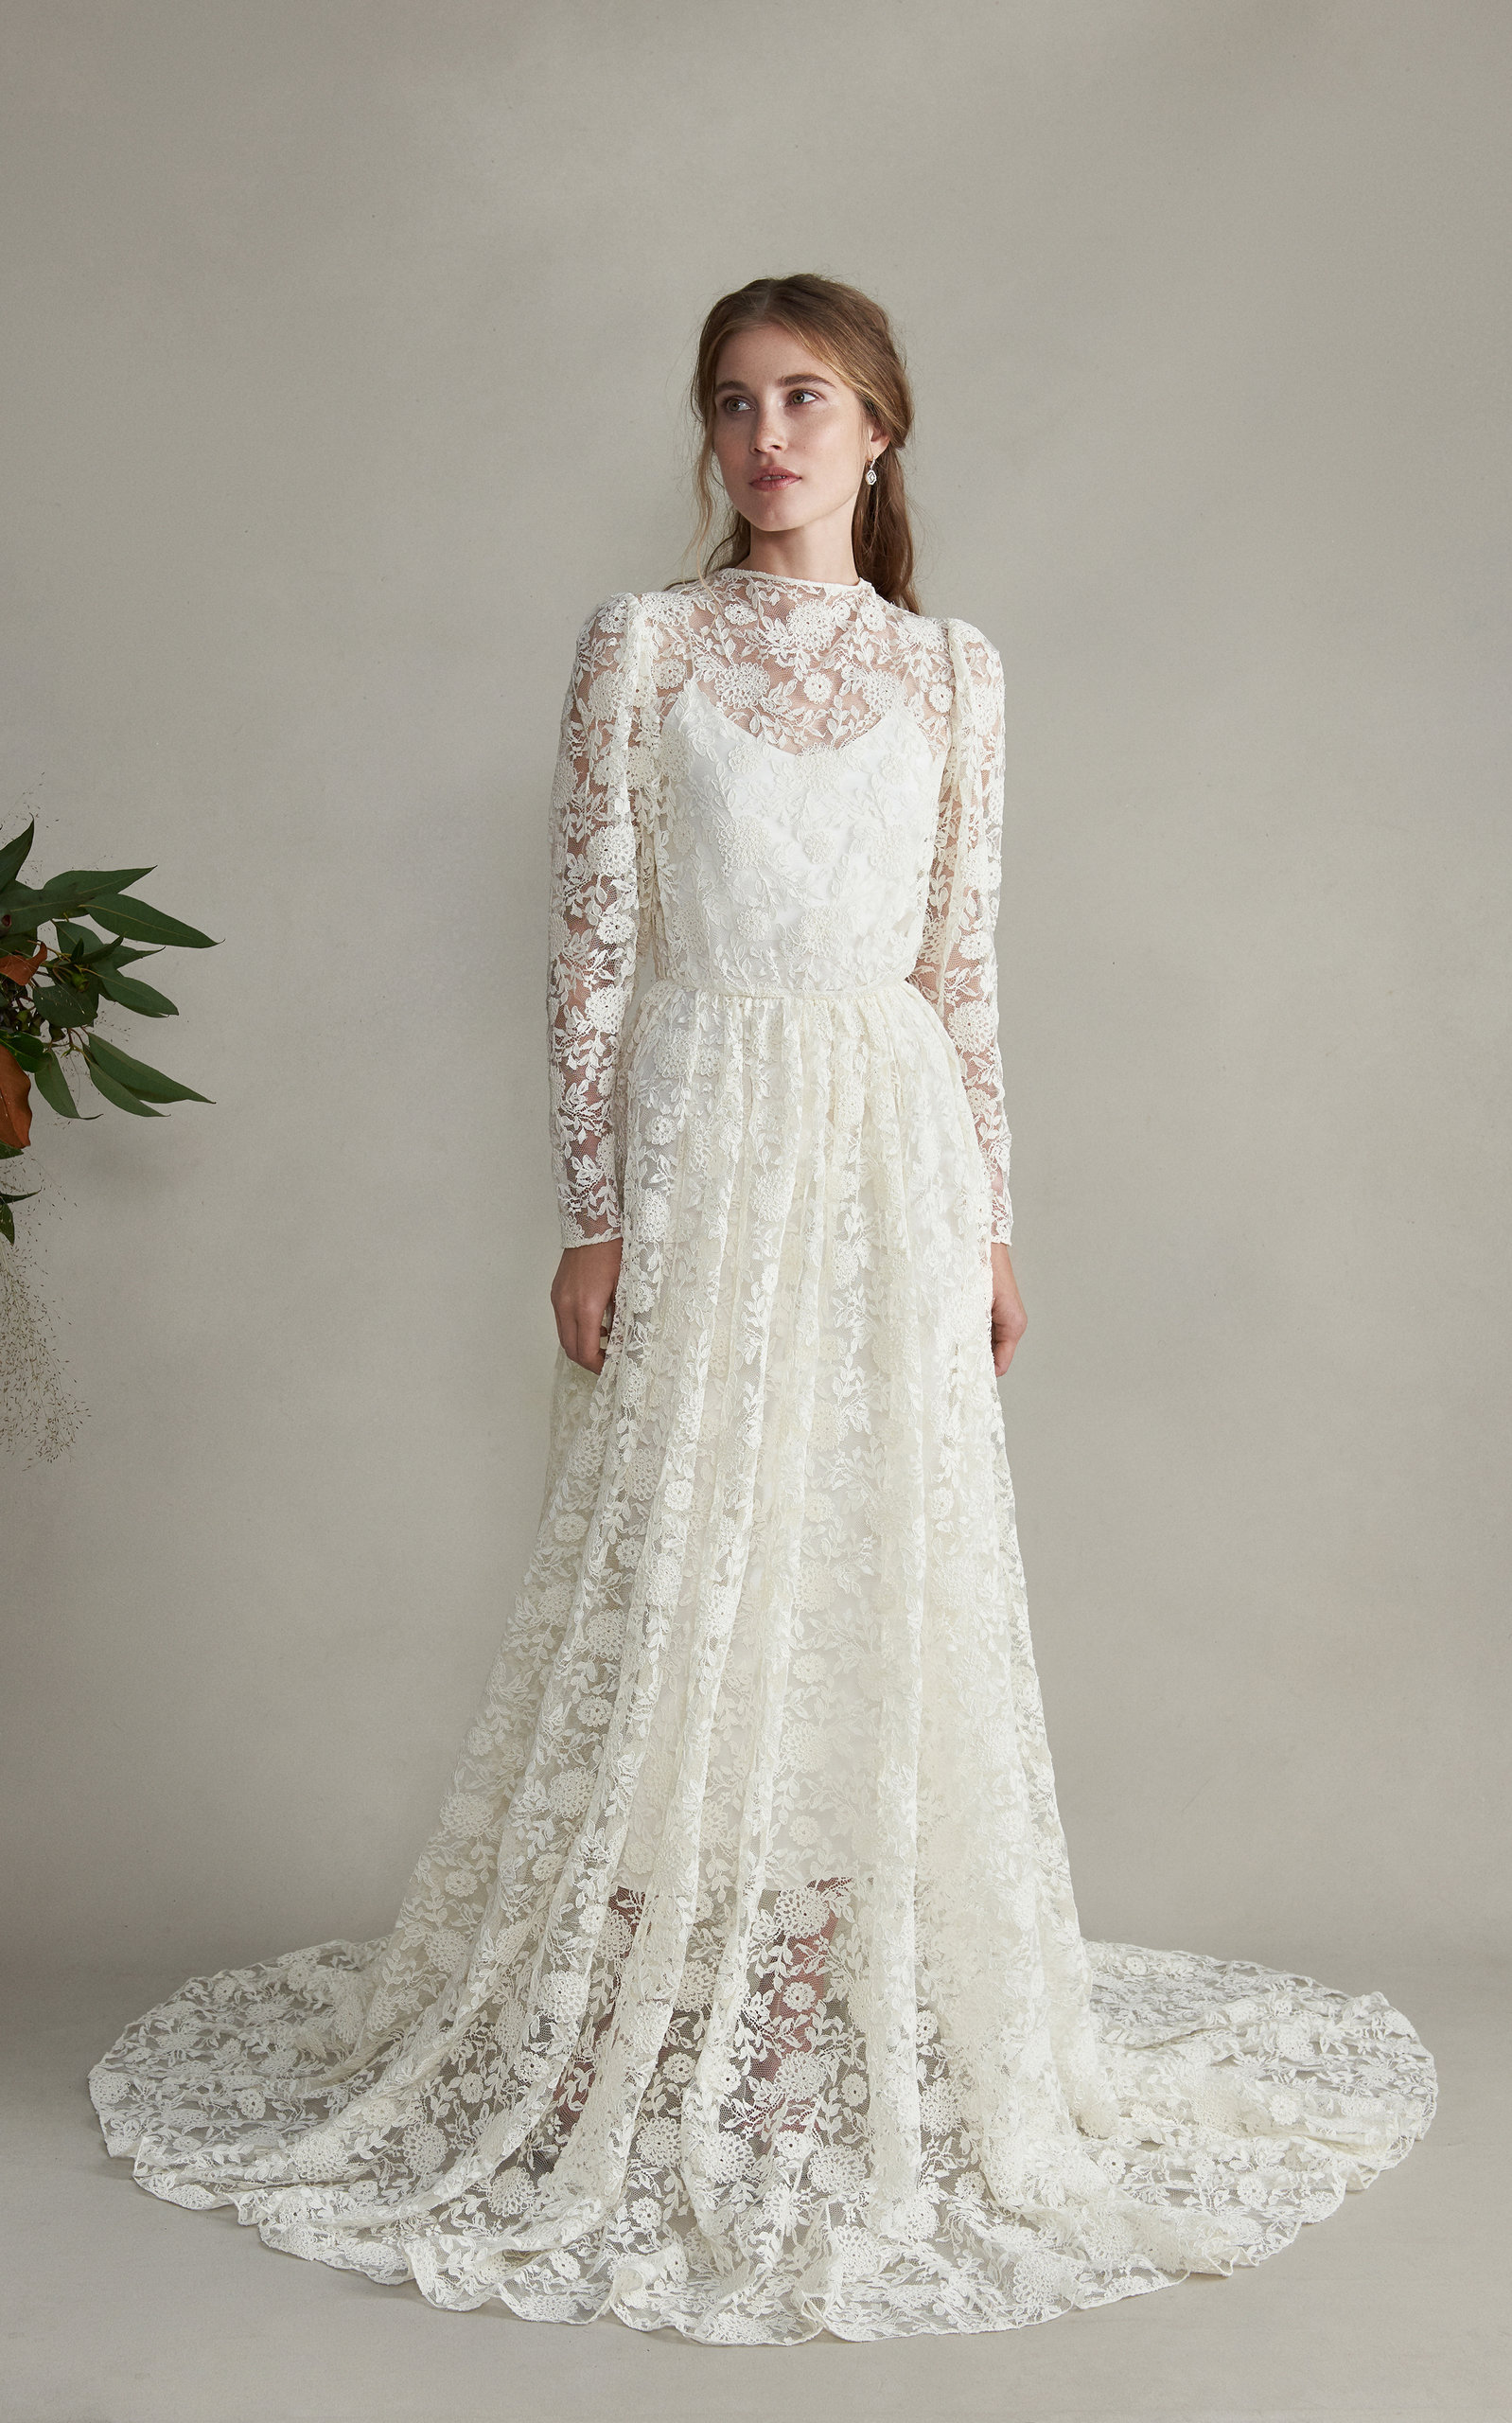 MARKARIAN Esperanza Lace High Neck Silk Sleeved Gown in White